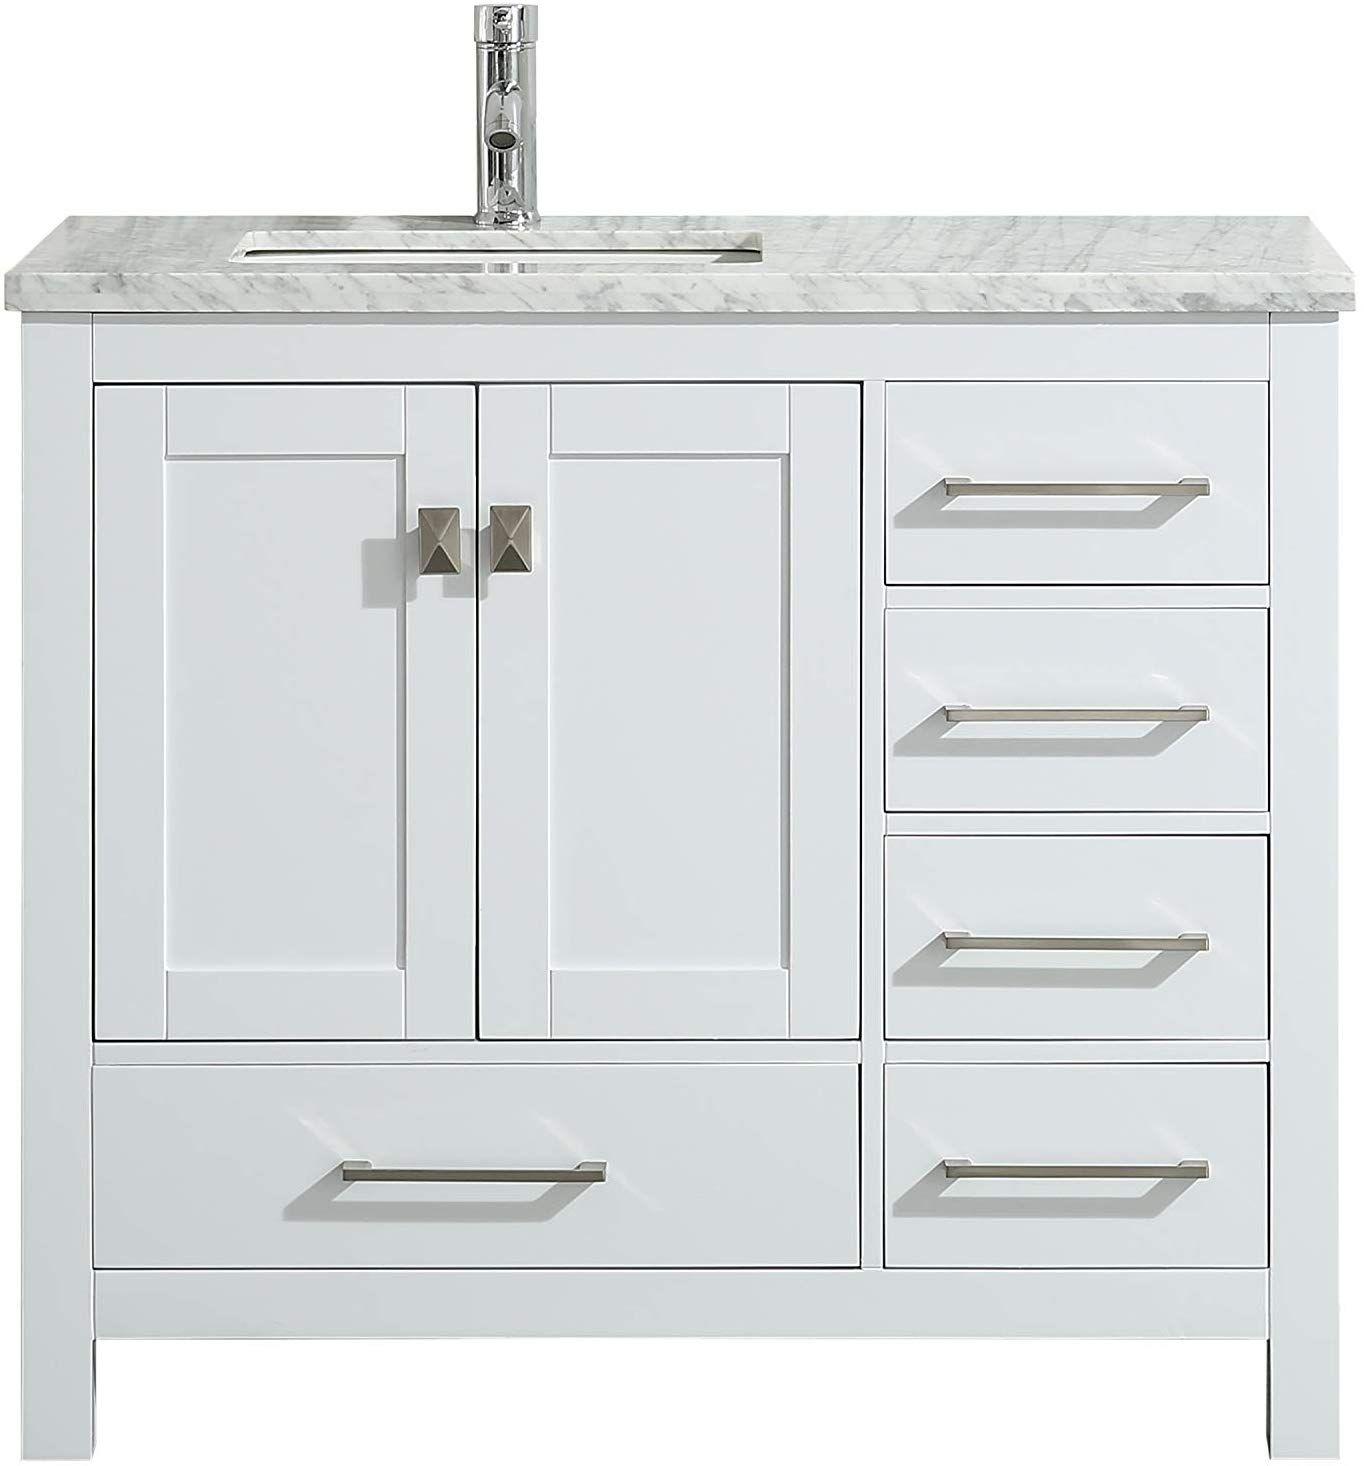 Eviva Tvn414 36x18wh London 36 White Bathroom Vanity Combination Bathroom Vanity White Vanity Bathroom Bathroom Vanity Base